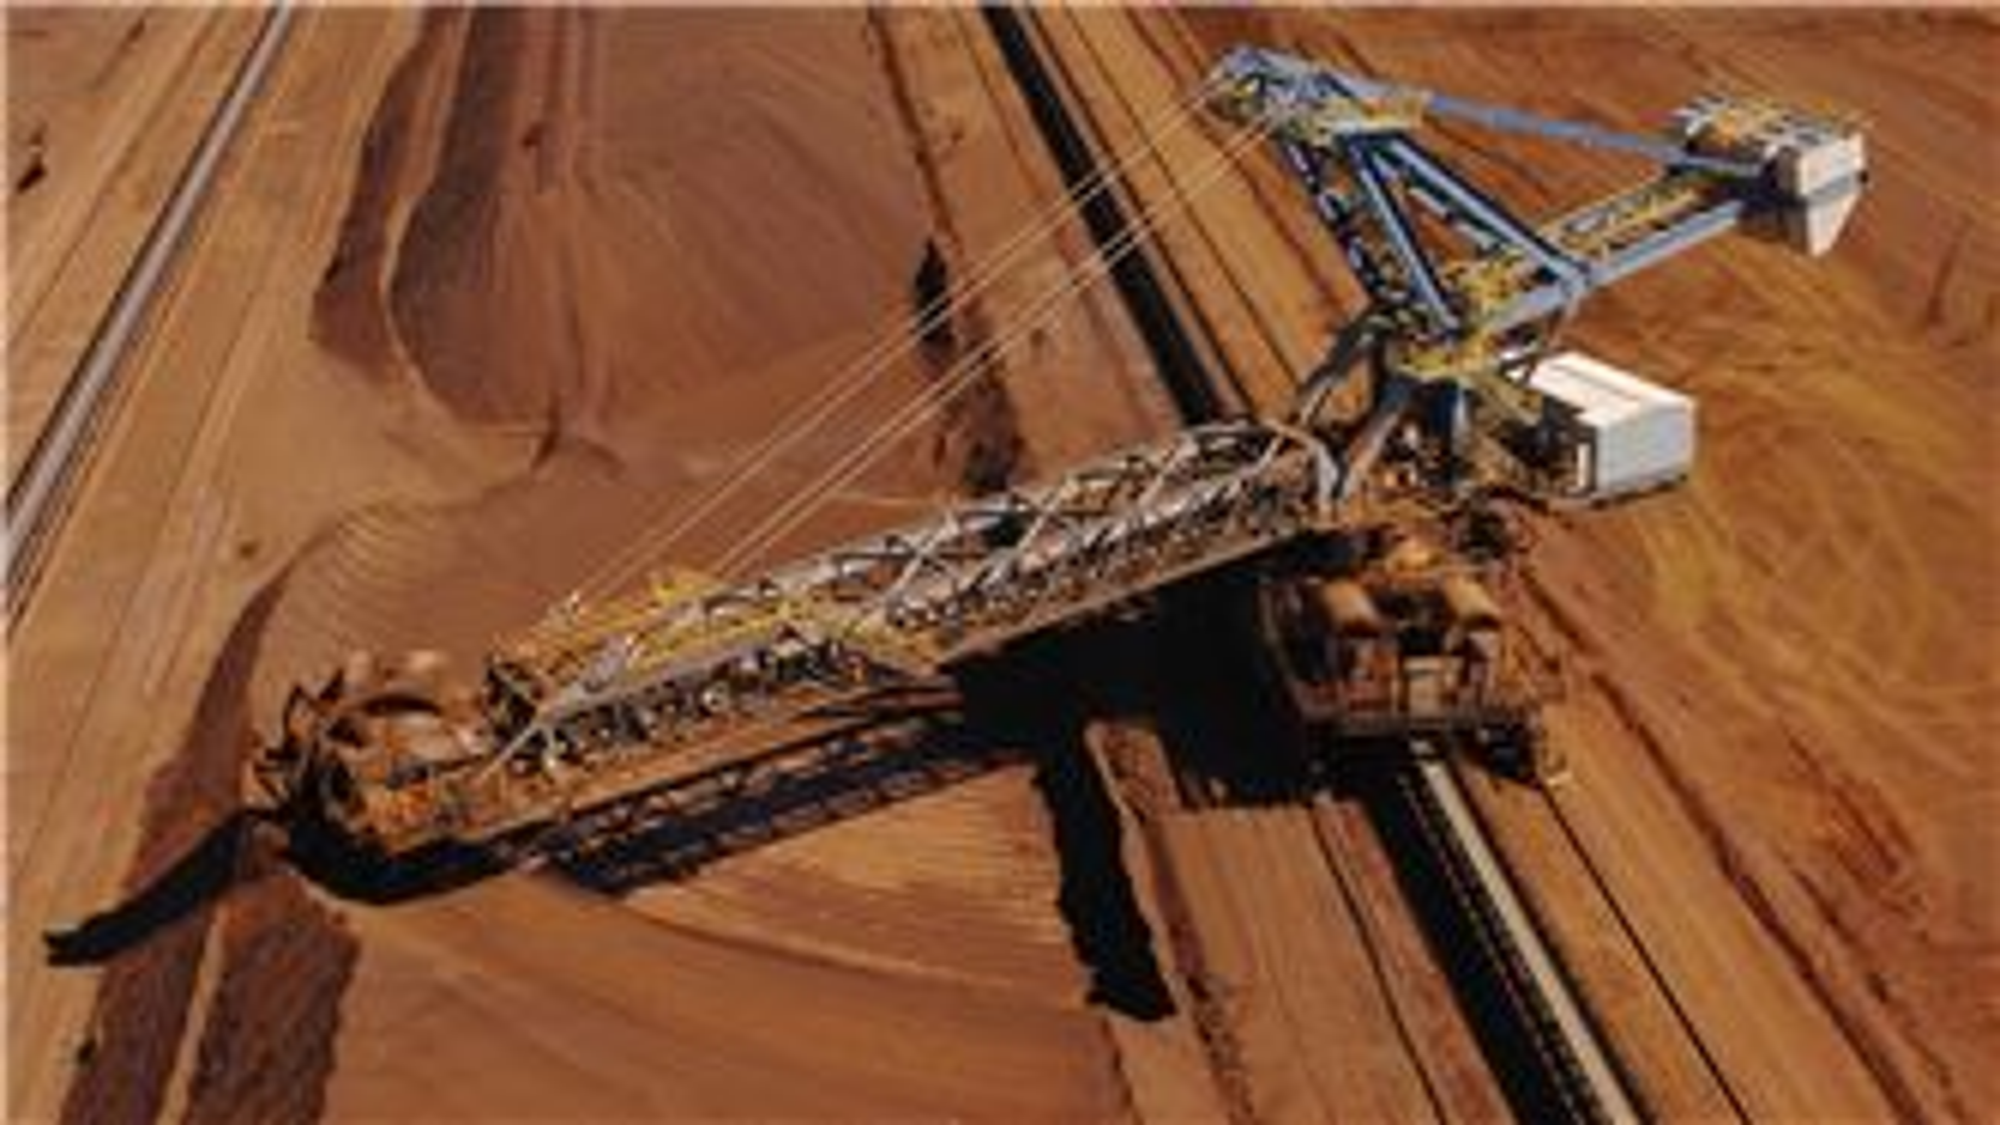 SUEZ mining & metals header. Outback Australia. Ore reclaiming machine crushing iron ore.